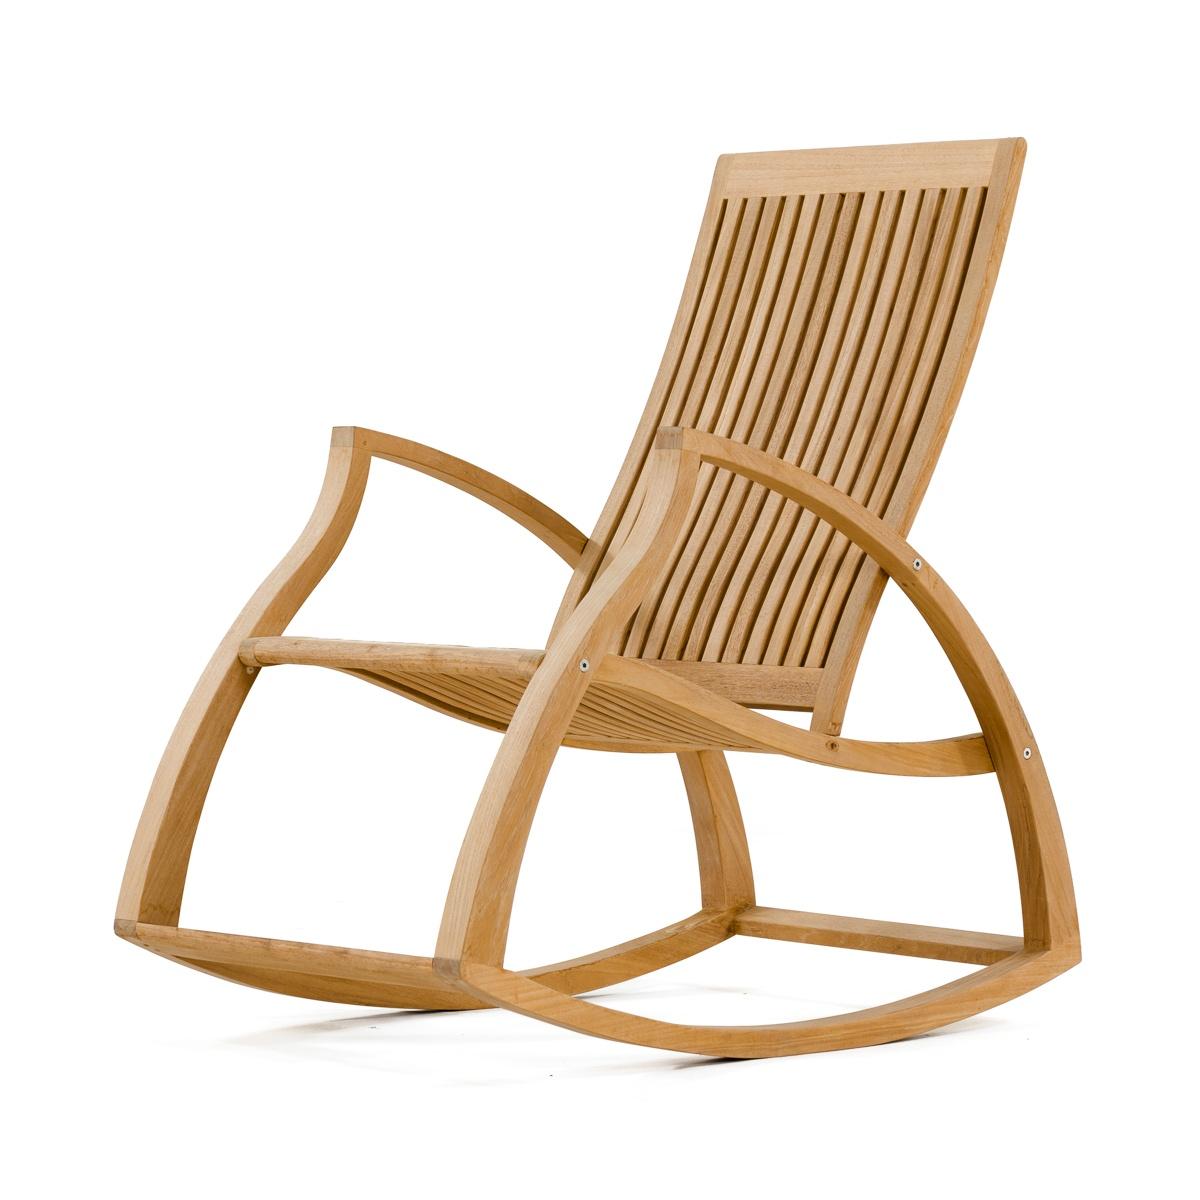 westminster teak contemporary modern teak rocking chair. Black Bedroom Furniture Sets. Home Design Ideas